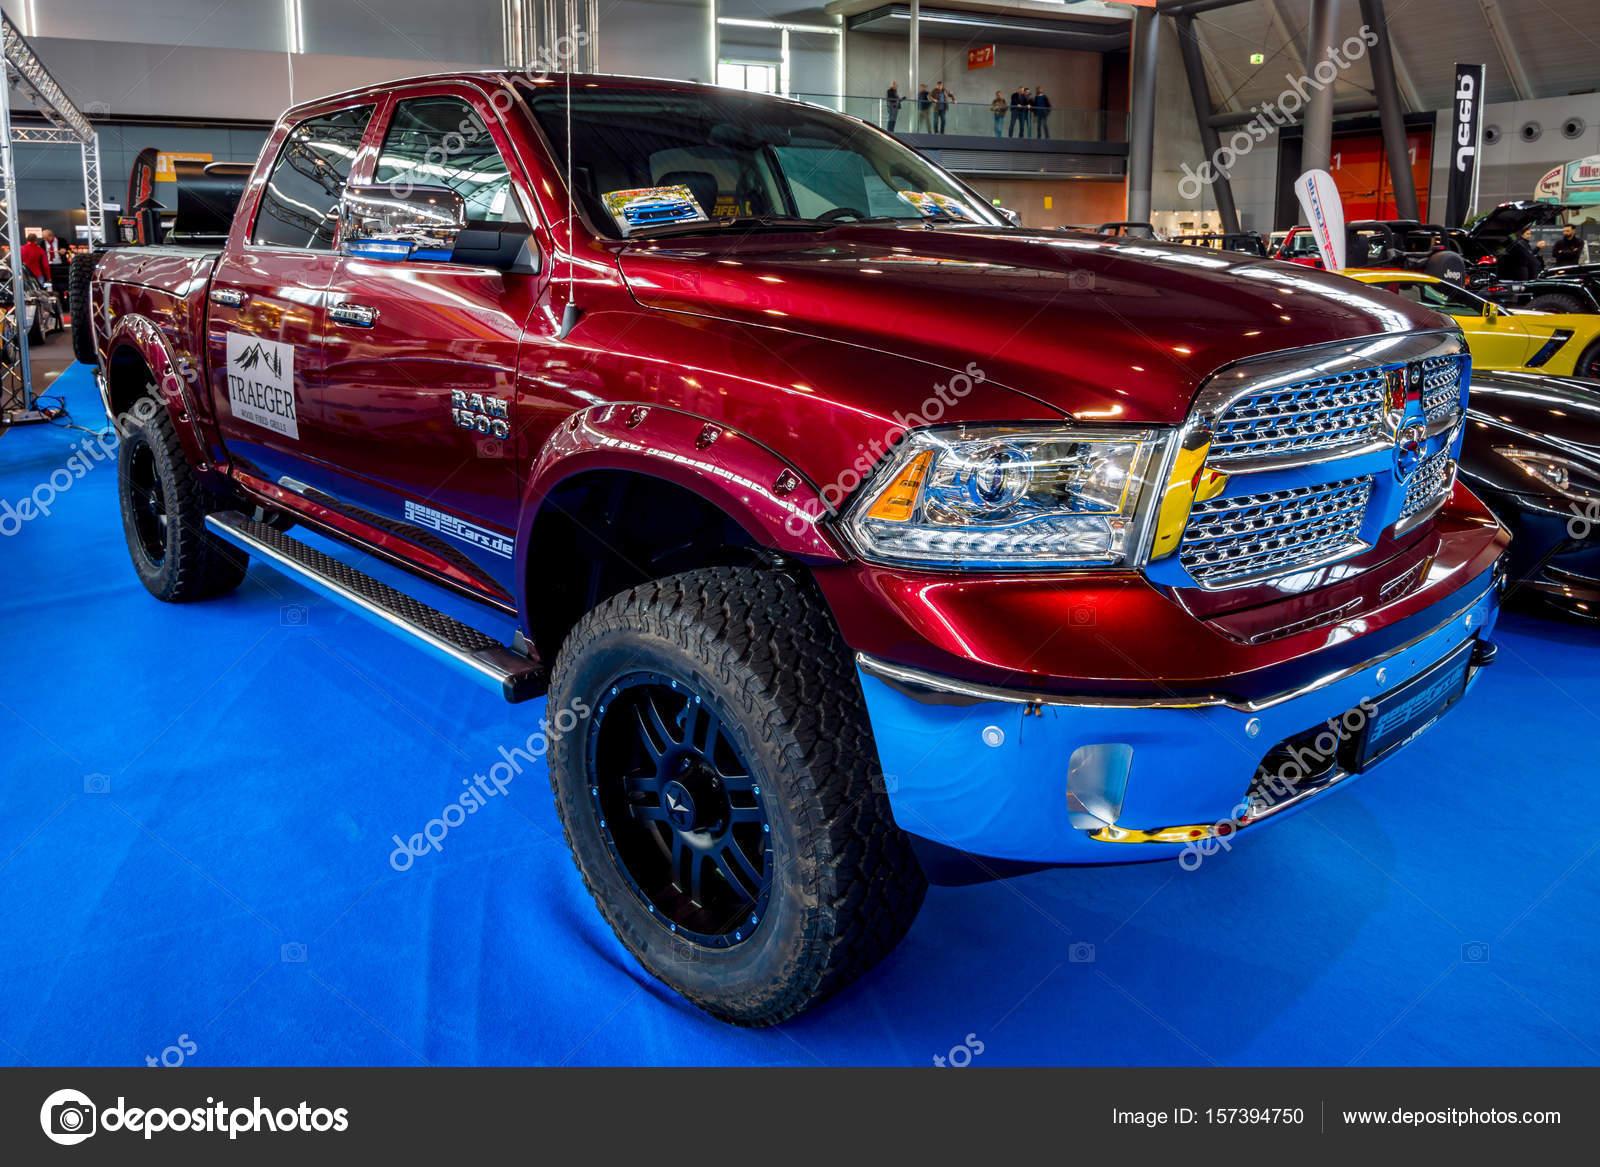 Imagenes Dodge Ram 2017 >> Imagenes Dodge Ram 2017 Tamano Completa Camioneta Dodge Ram 1500